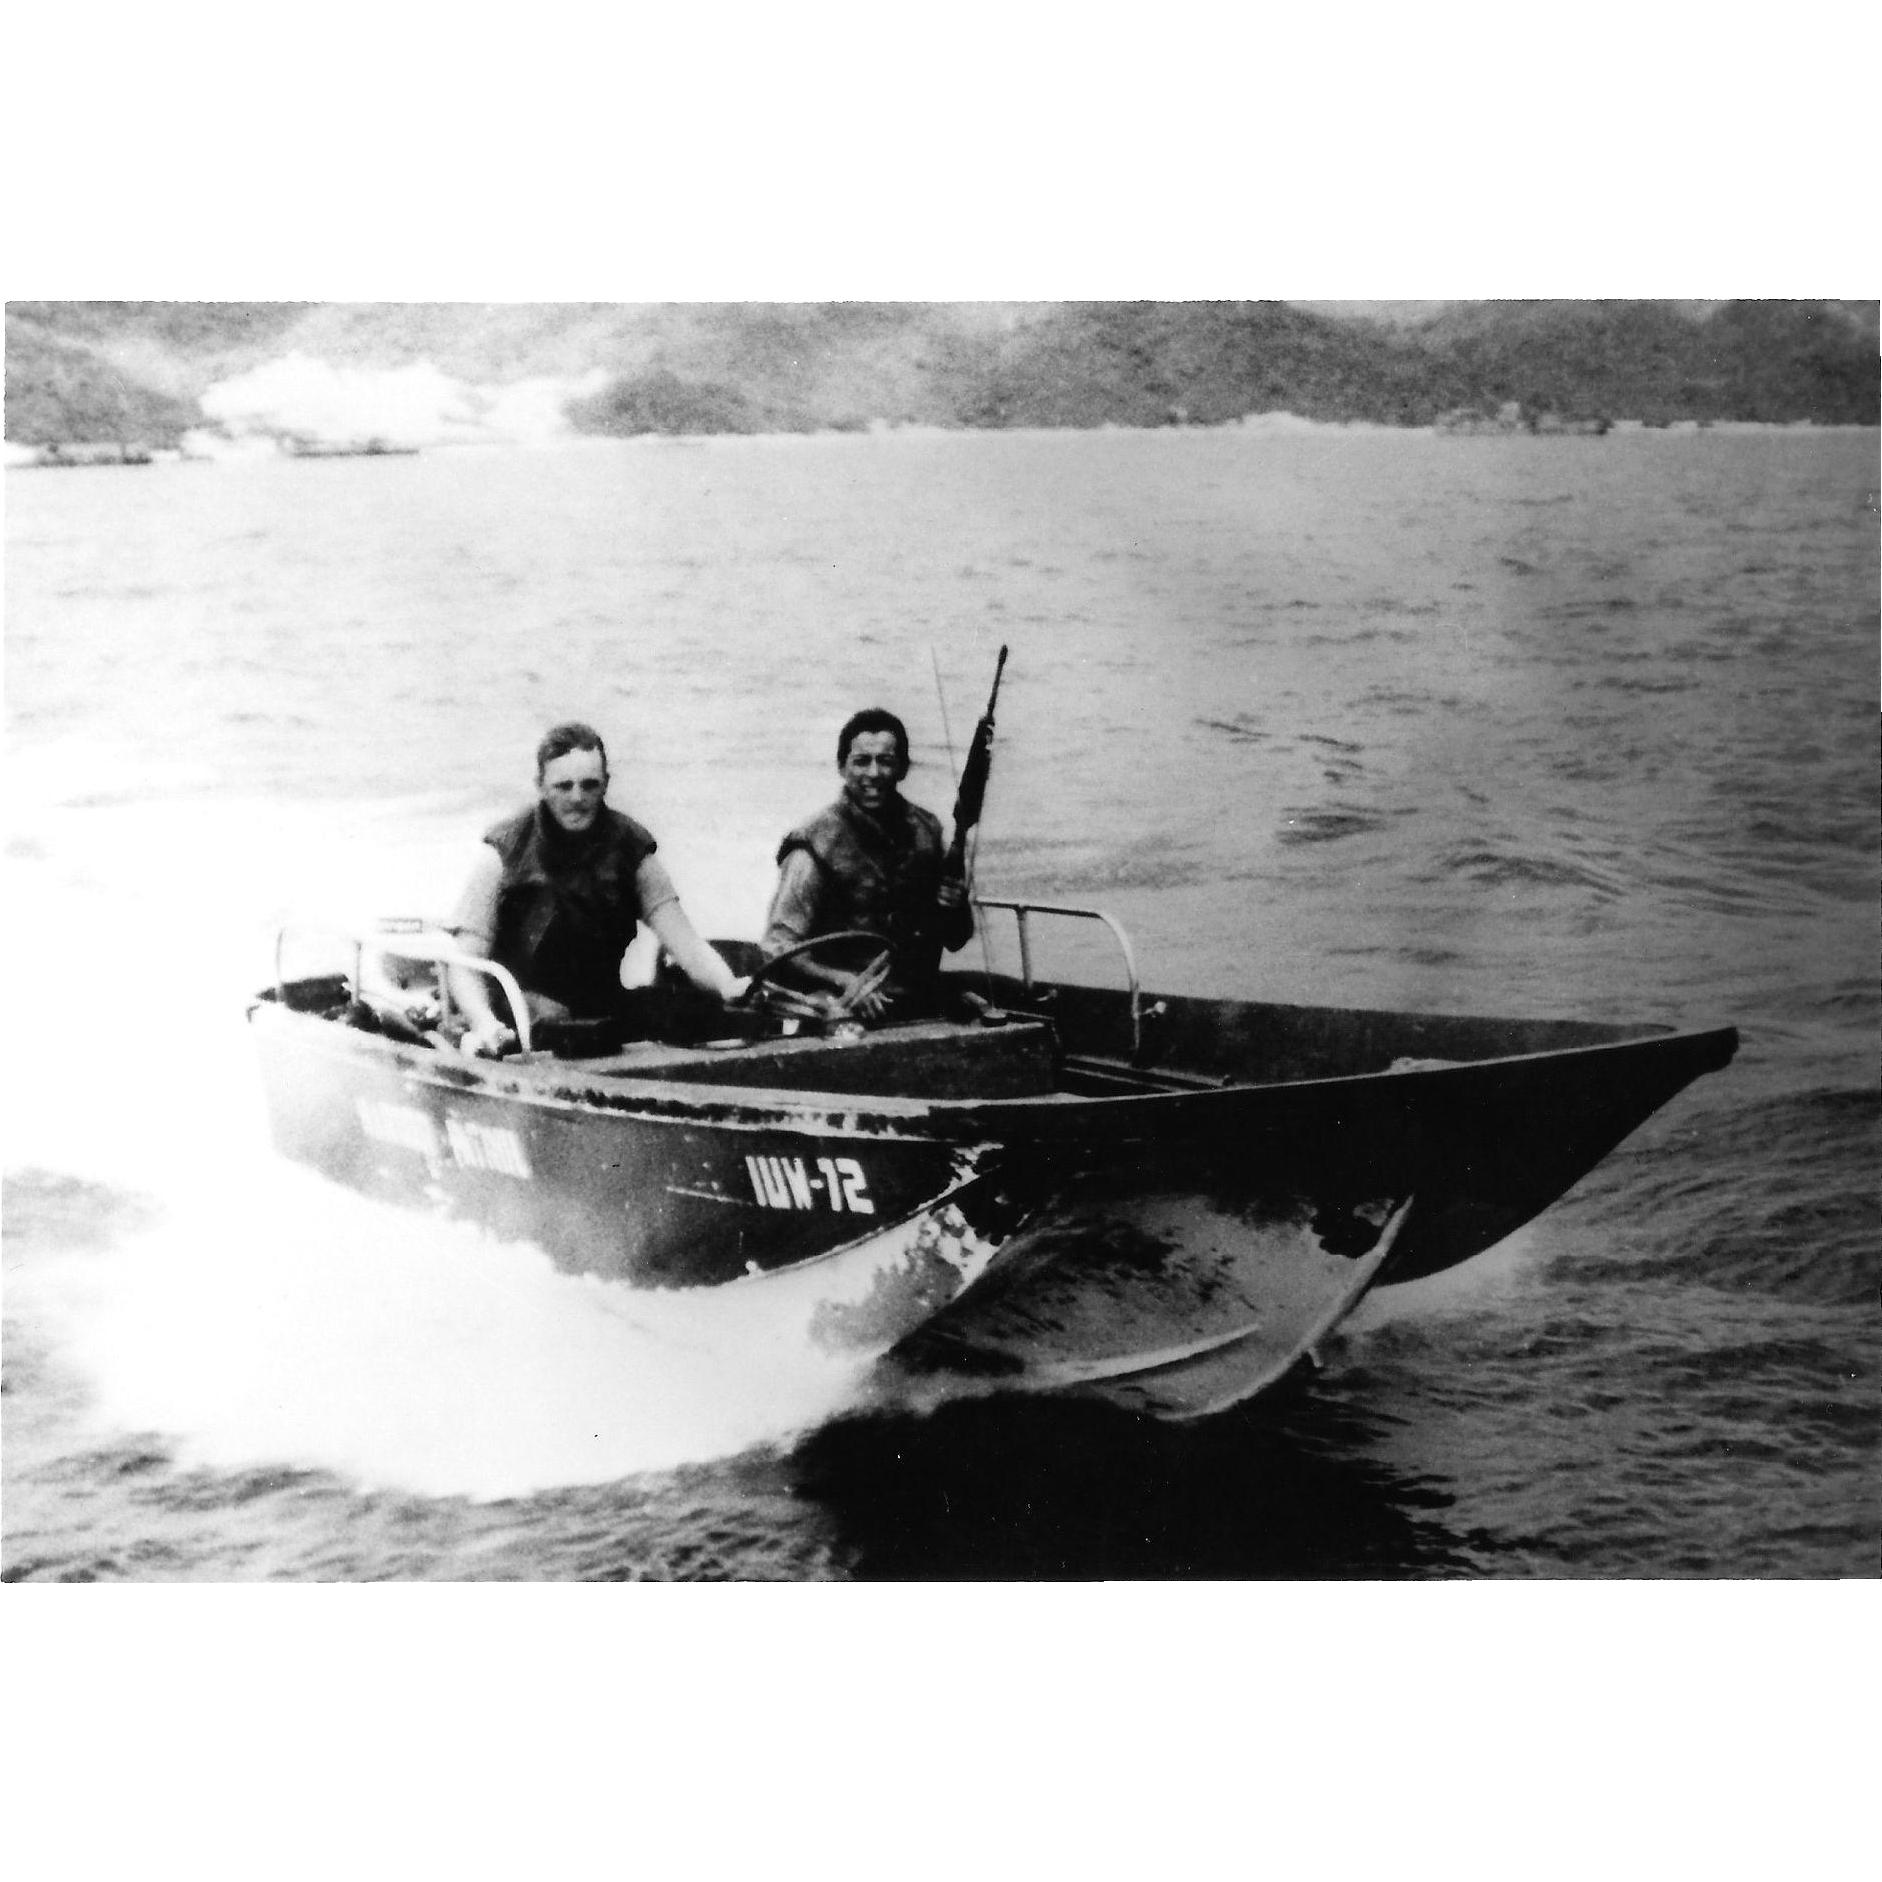 Vintage Photo Brown Water Navy Vietnam War Era Seal Assault Boat